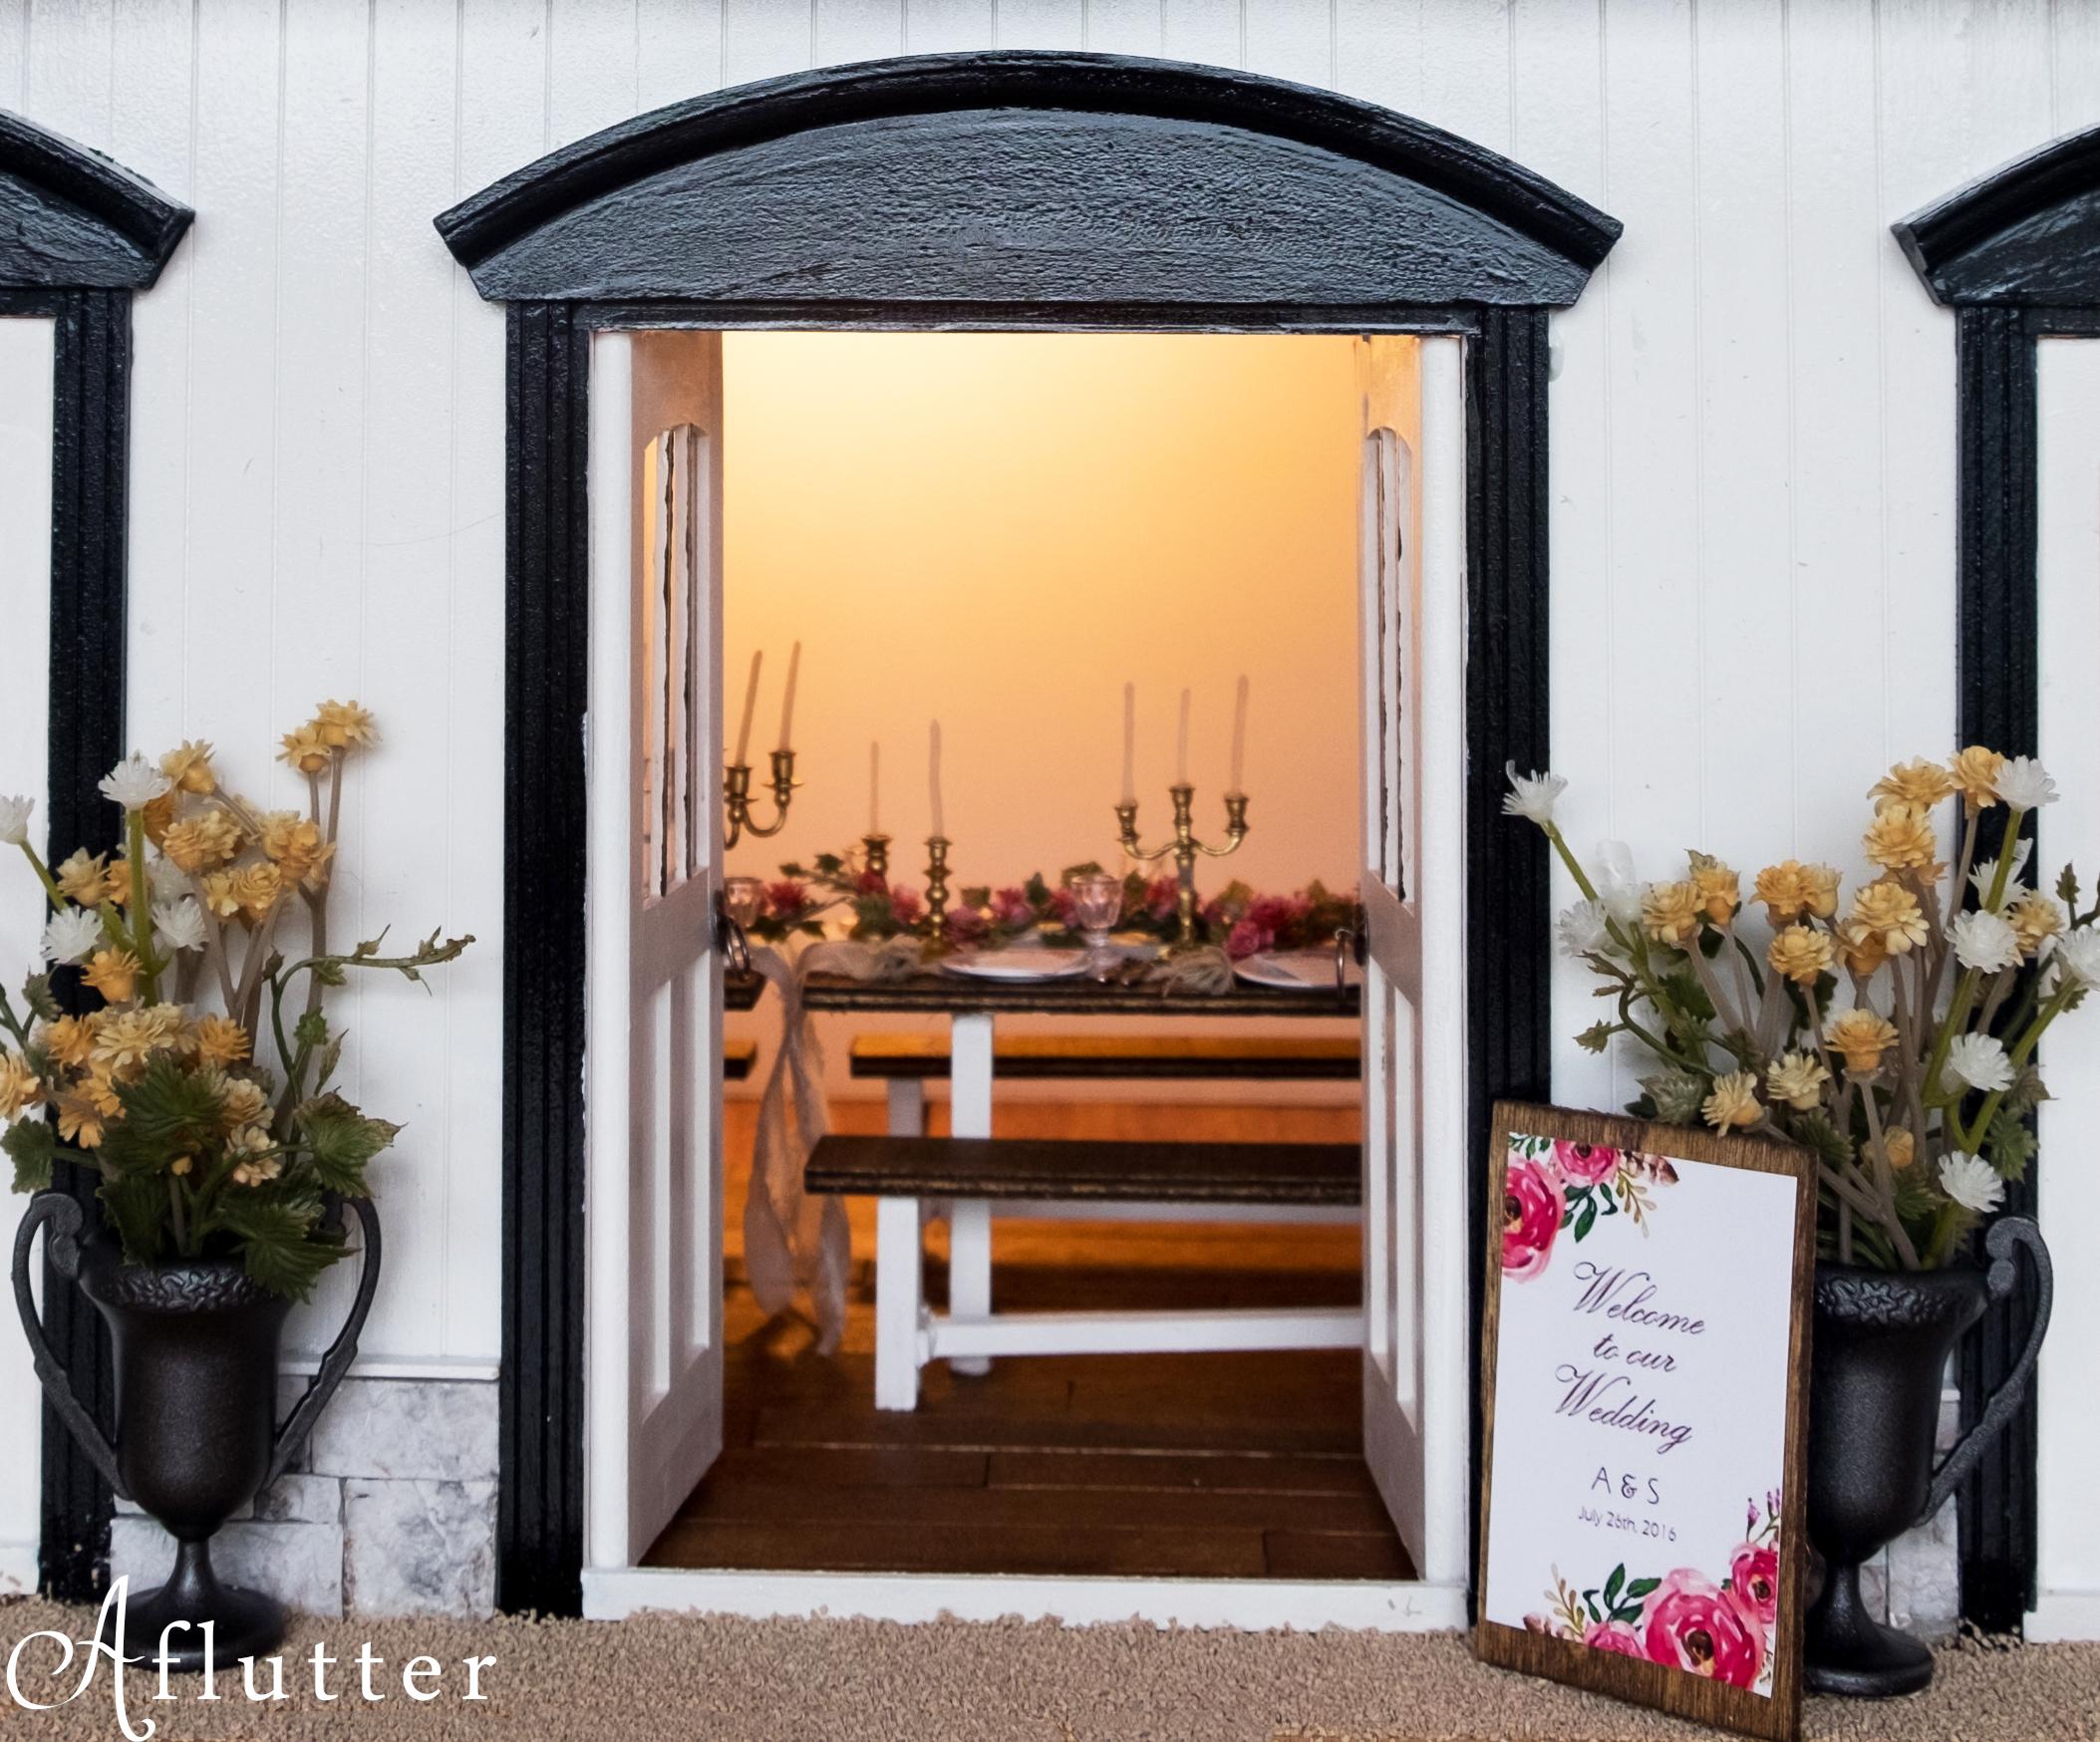 Brenul-Barn-Mini-Wedding-1-of-16.jpg